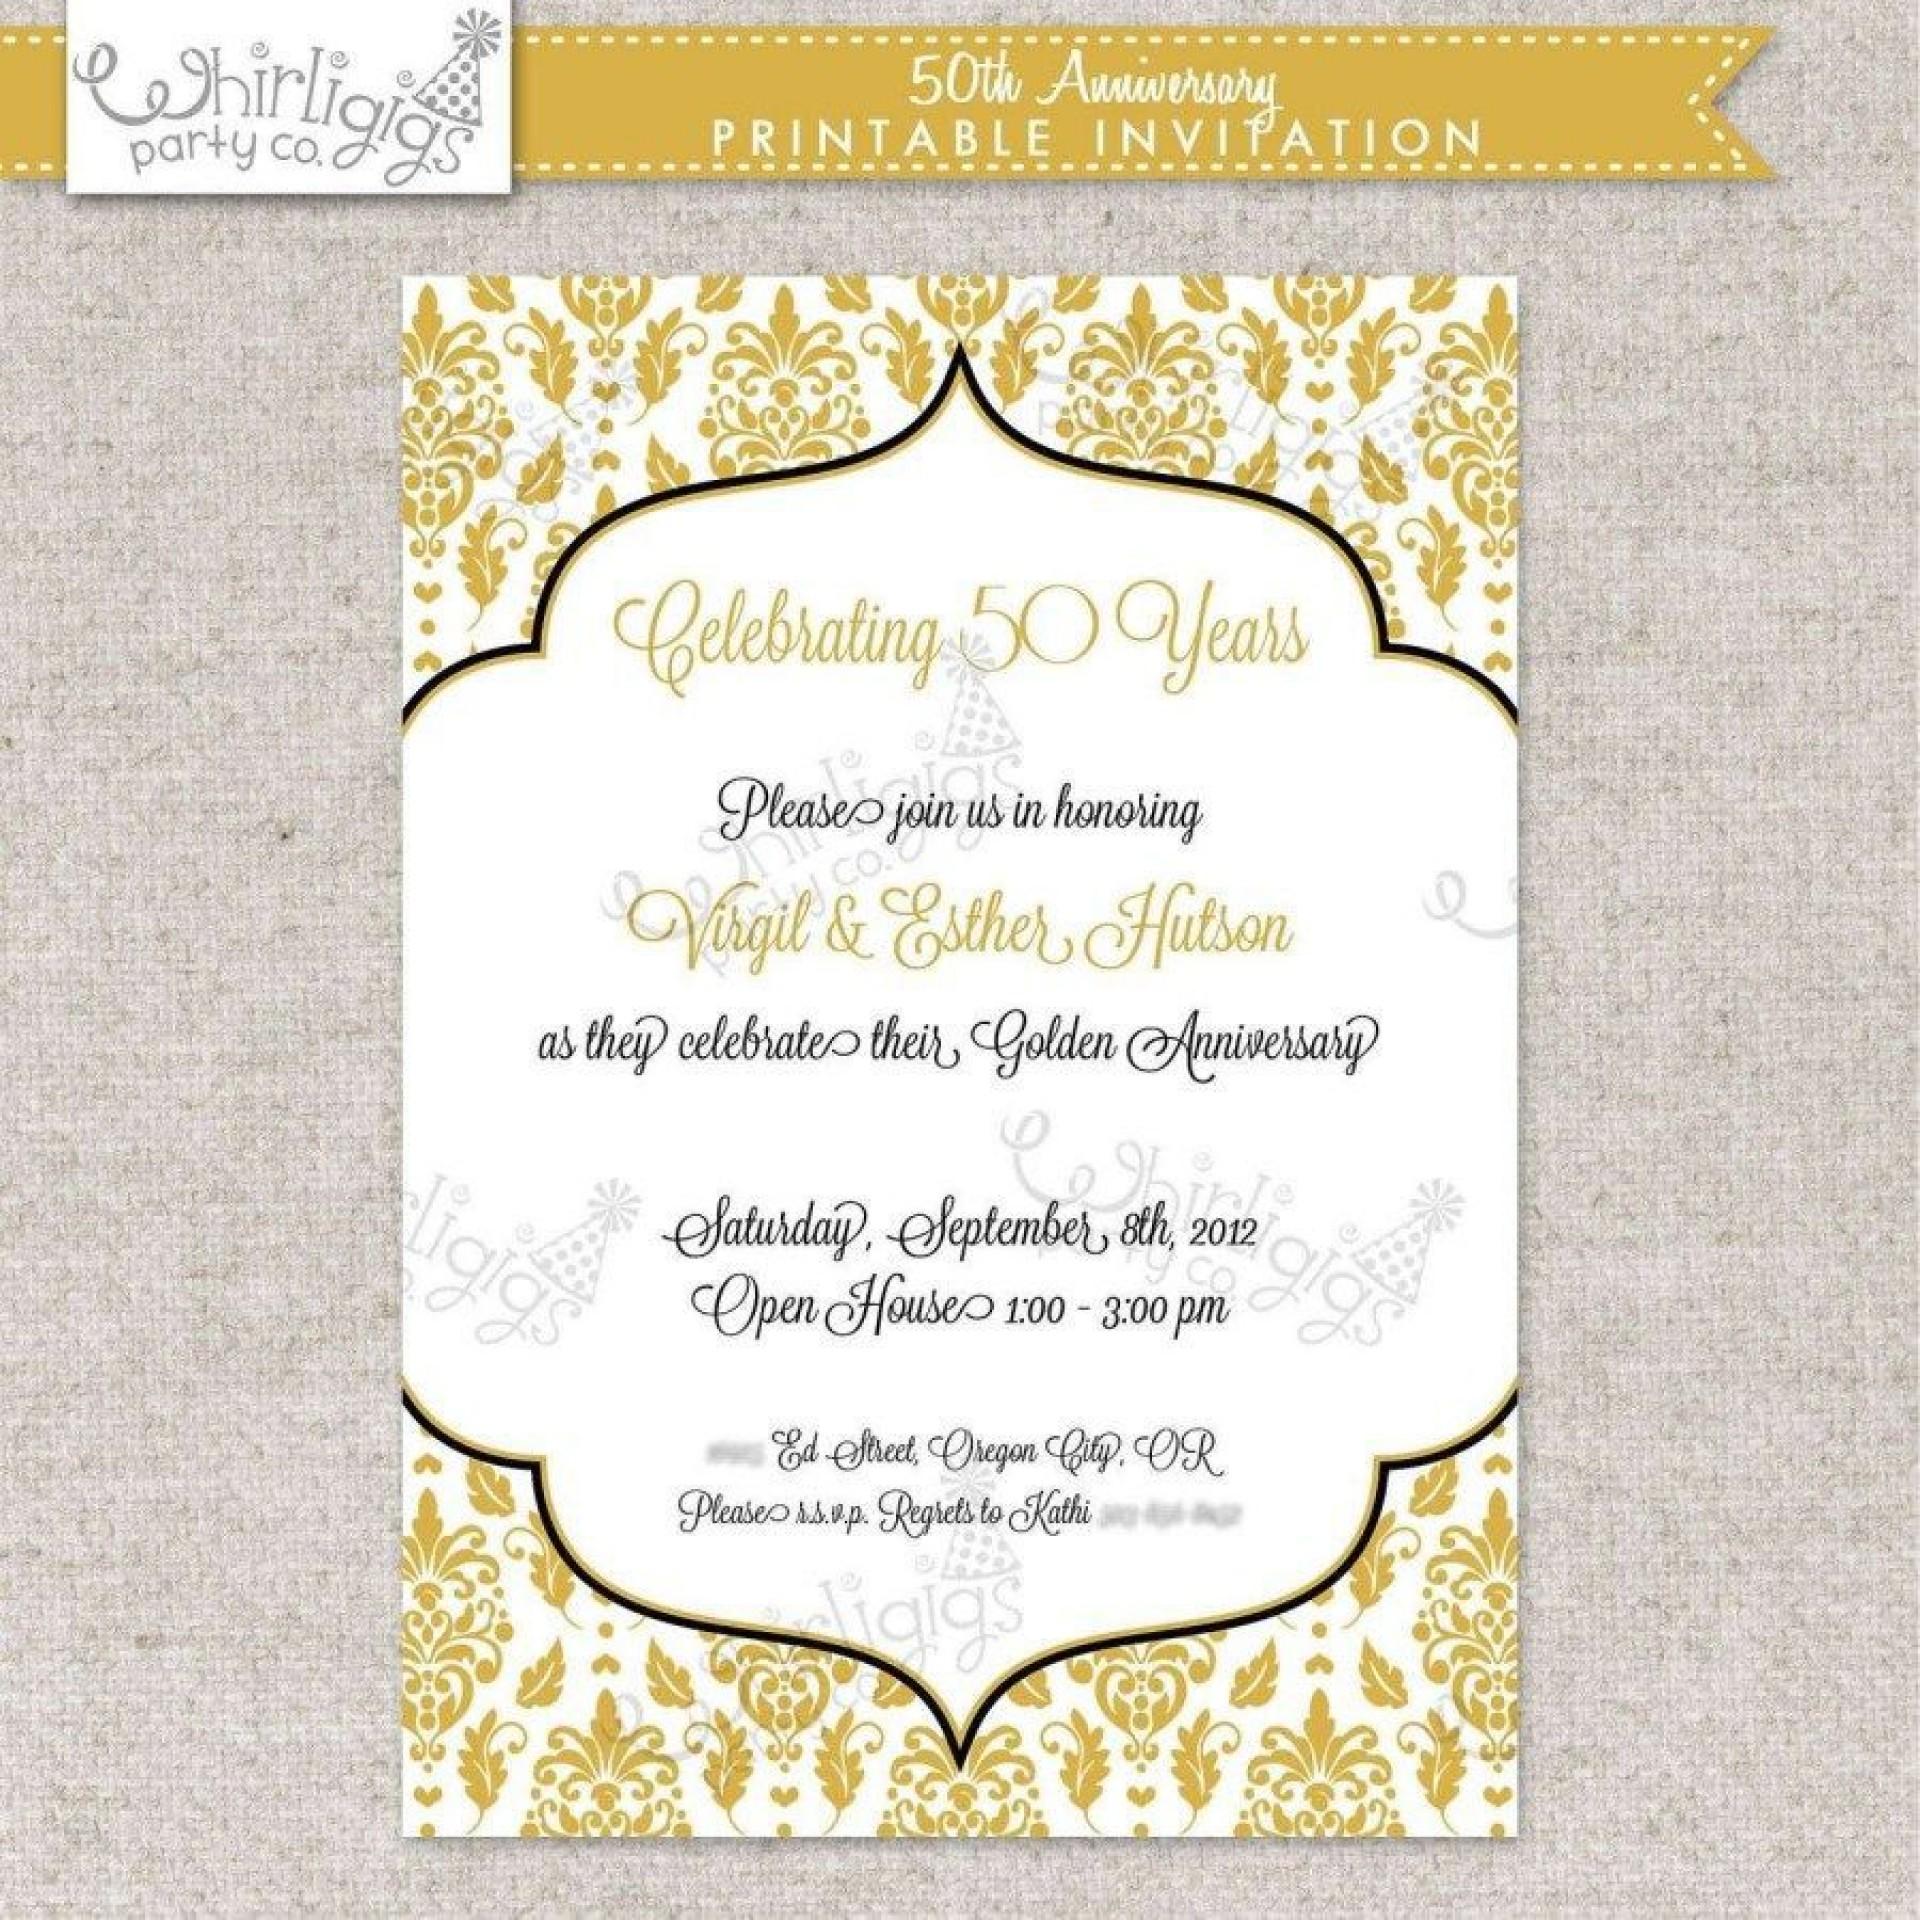 002 Fearsome Free Printable 50th Wedding Anniversary Invitation Template Concept 1920